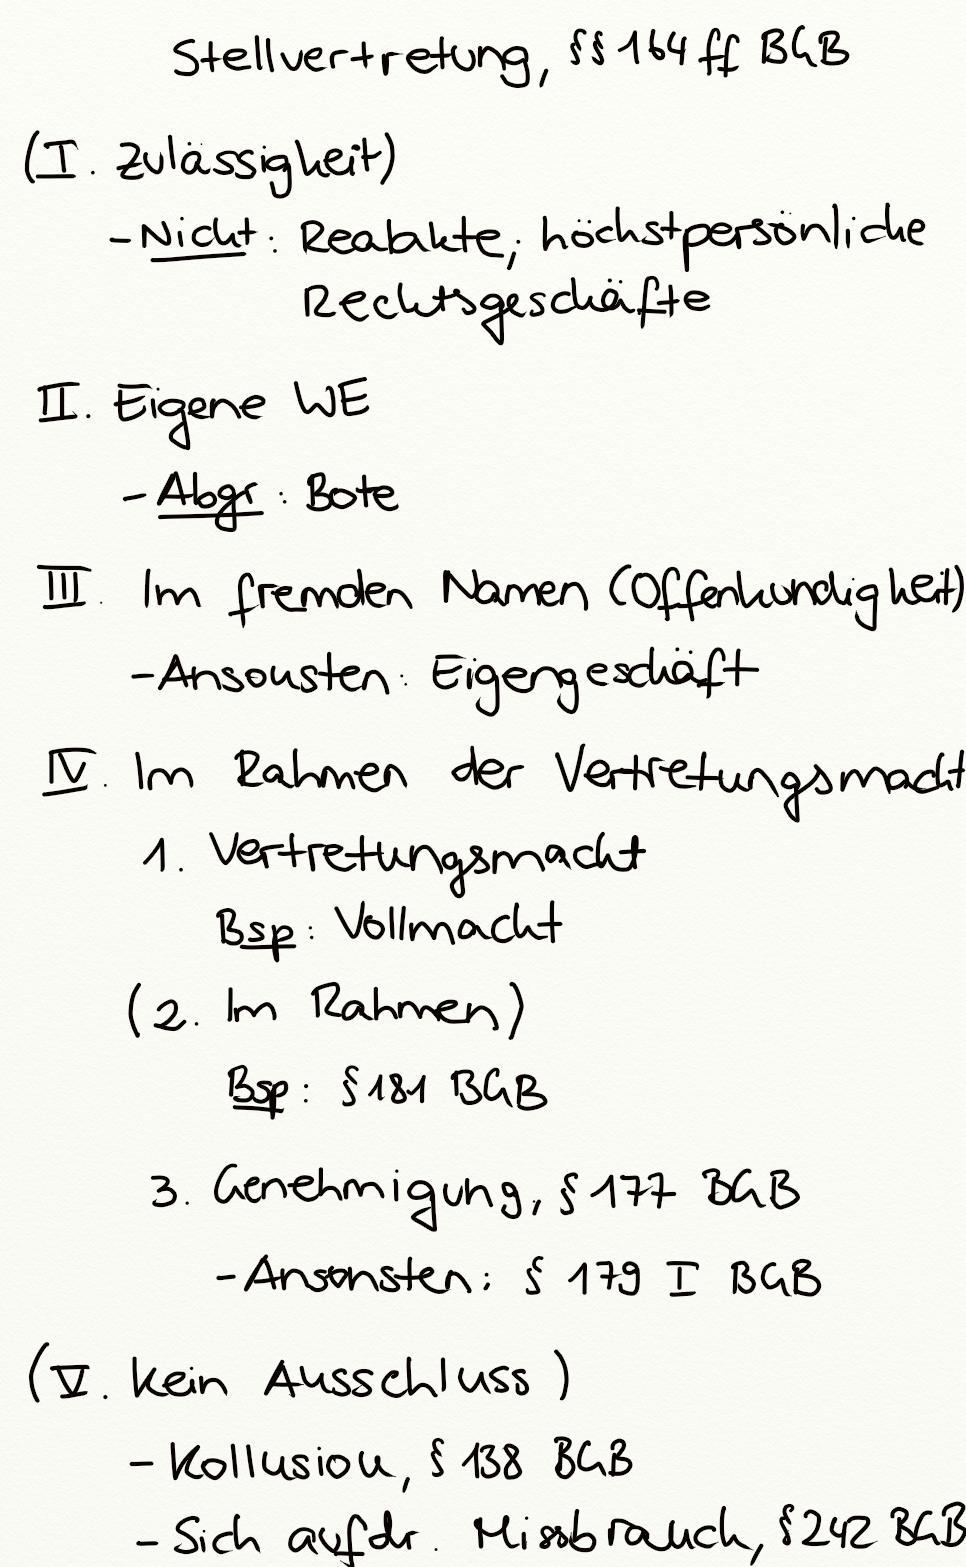 § 164 bgb